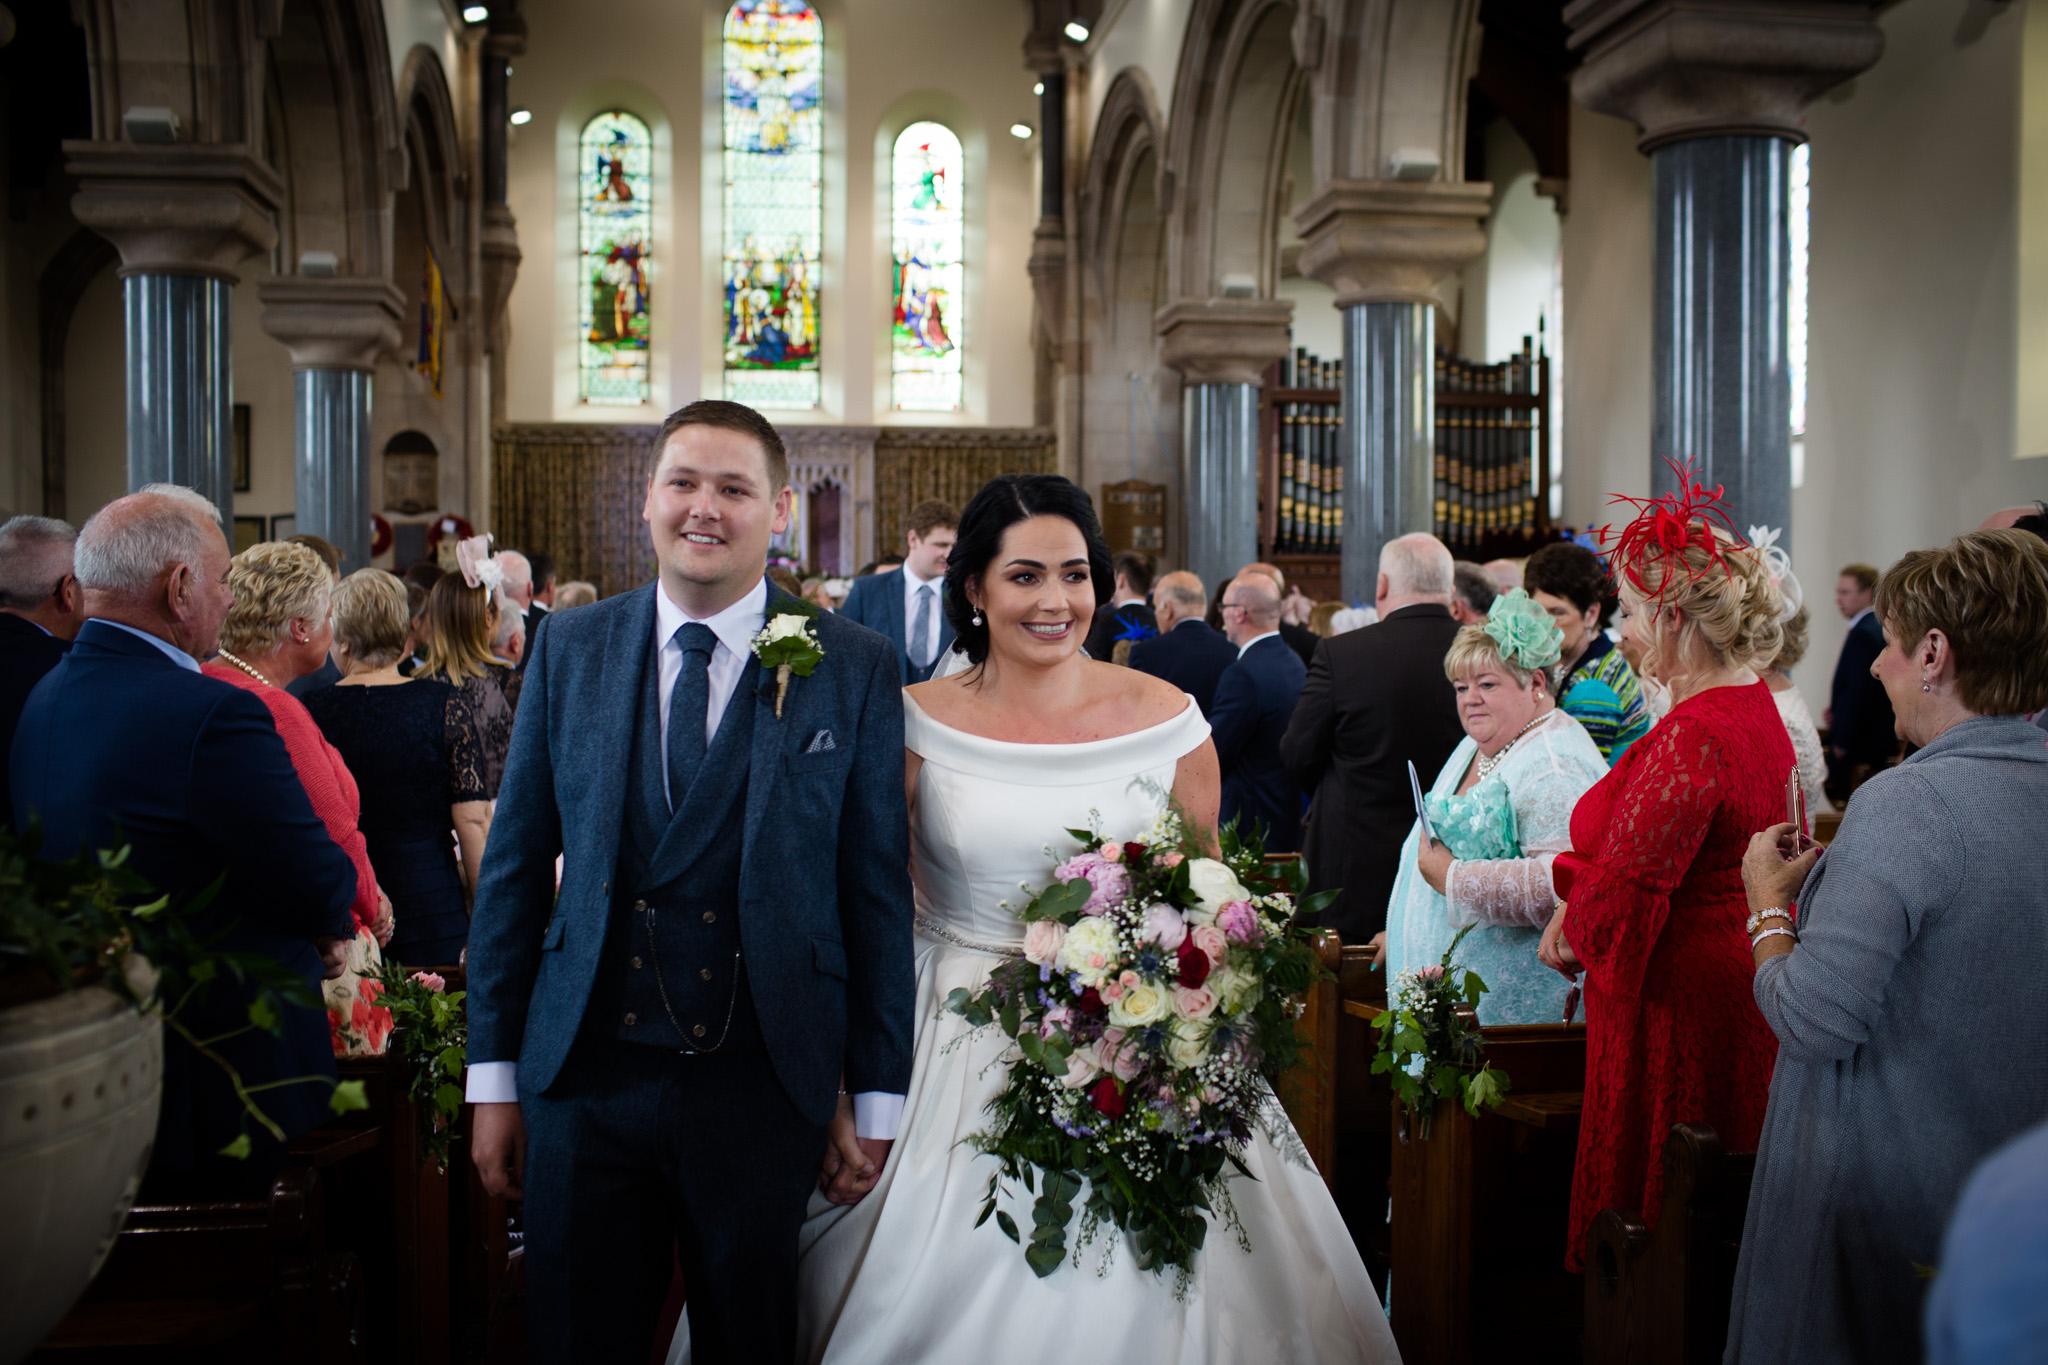 Mark_Barnes_Northern_Ireland_Wedding_Photography_Lusty_Beg_Wedding_Photography_Hayley&Brian-19.jpg